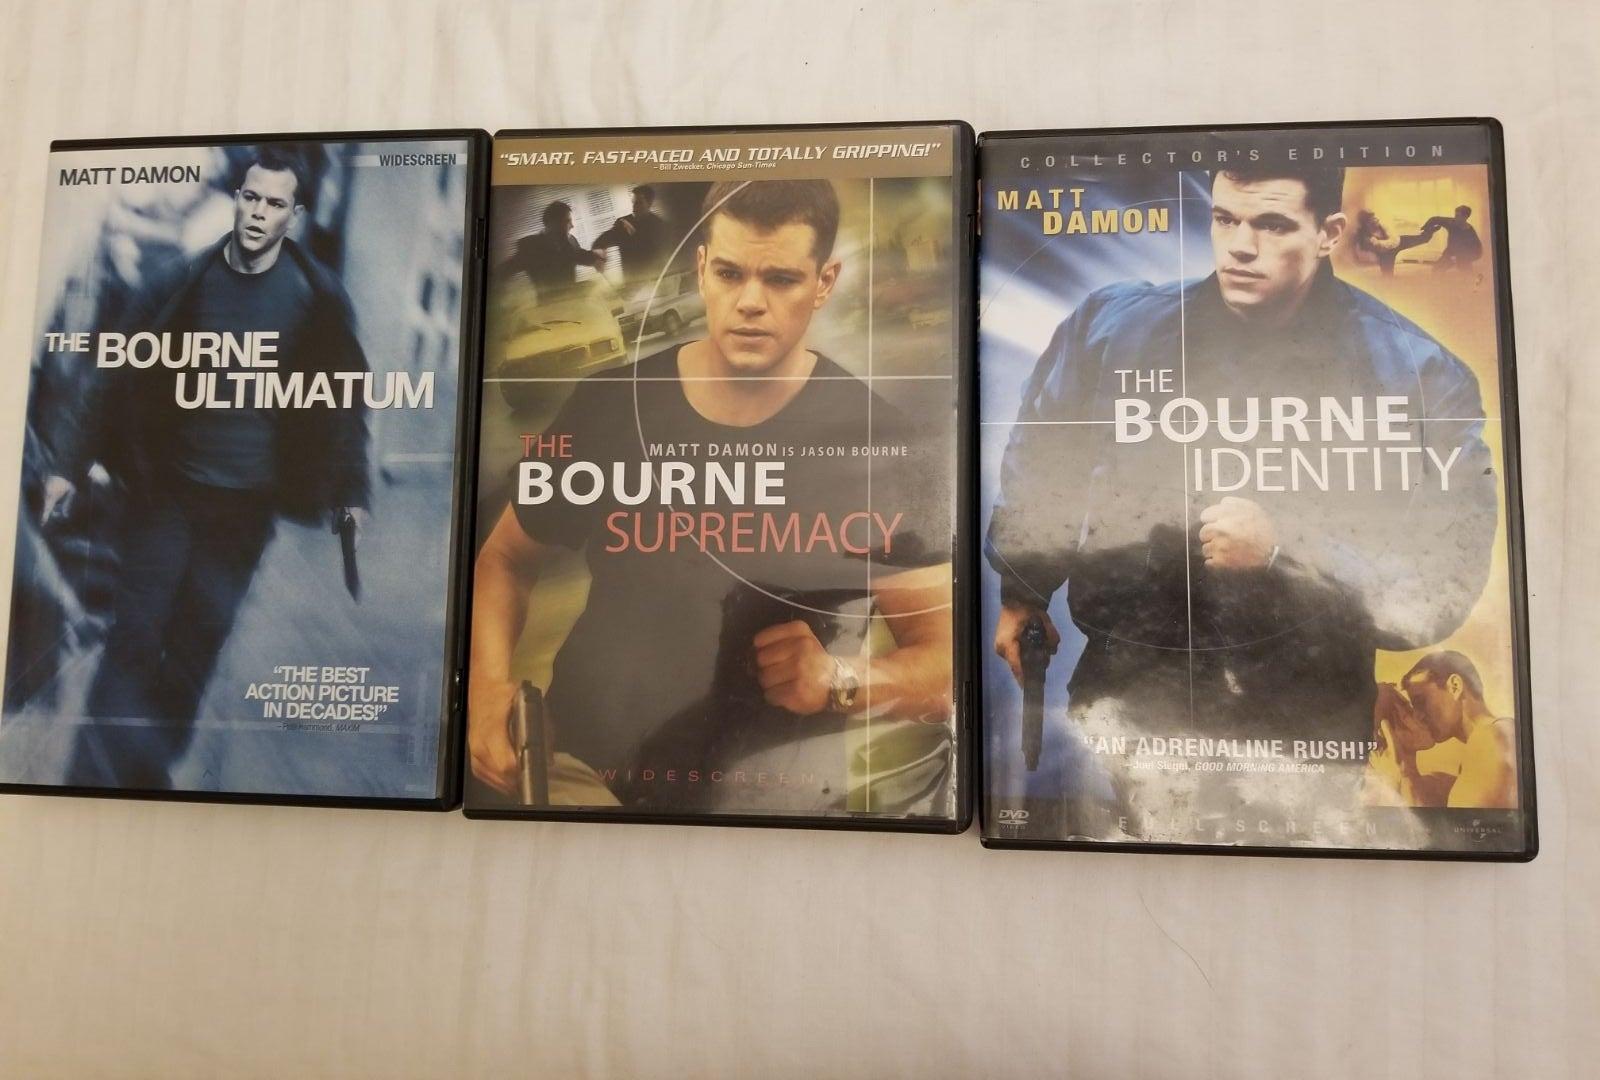 Bourne Trilogy DVD's